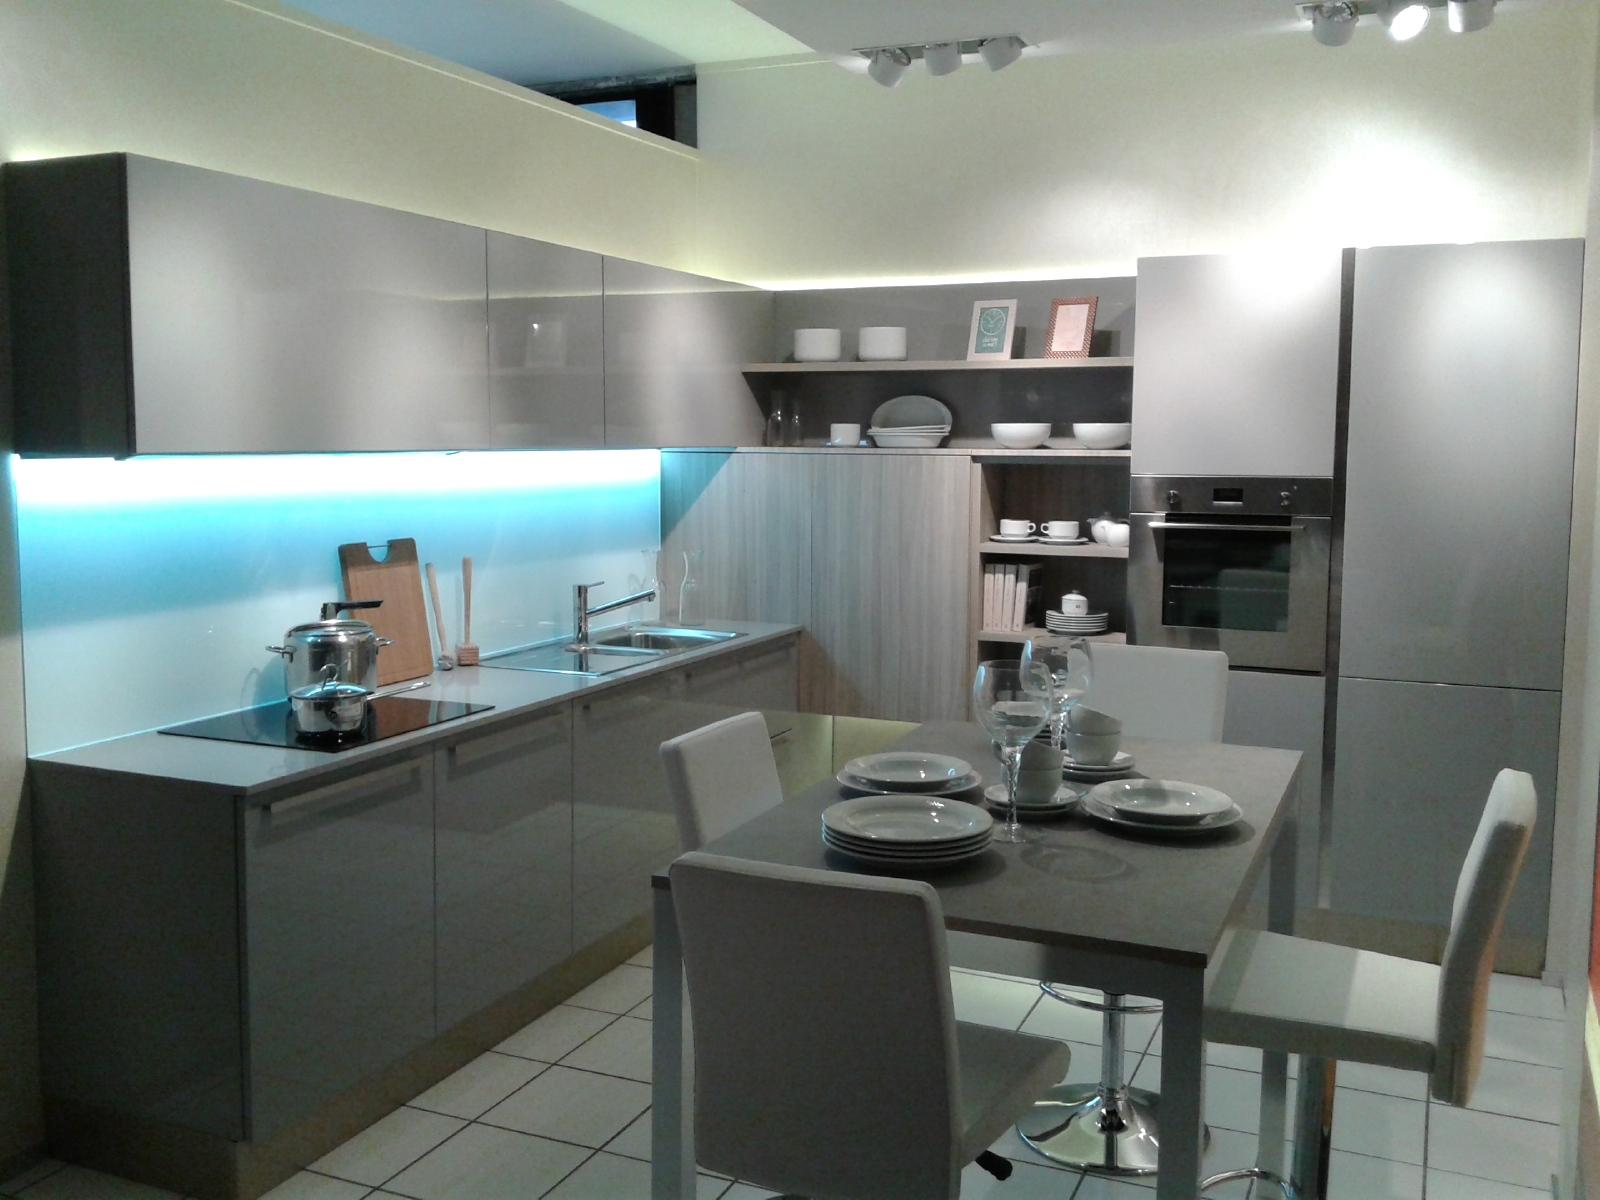 Awesome Cucina Veneta Milano Images - Ideas & Design 2017 ...